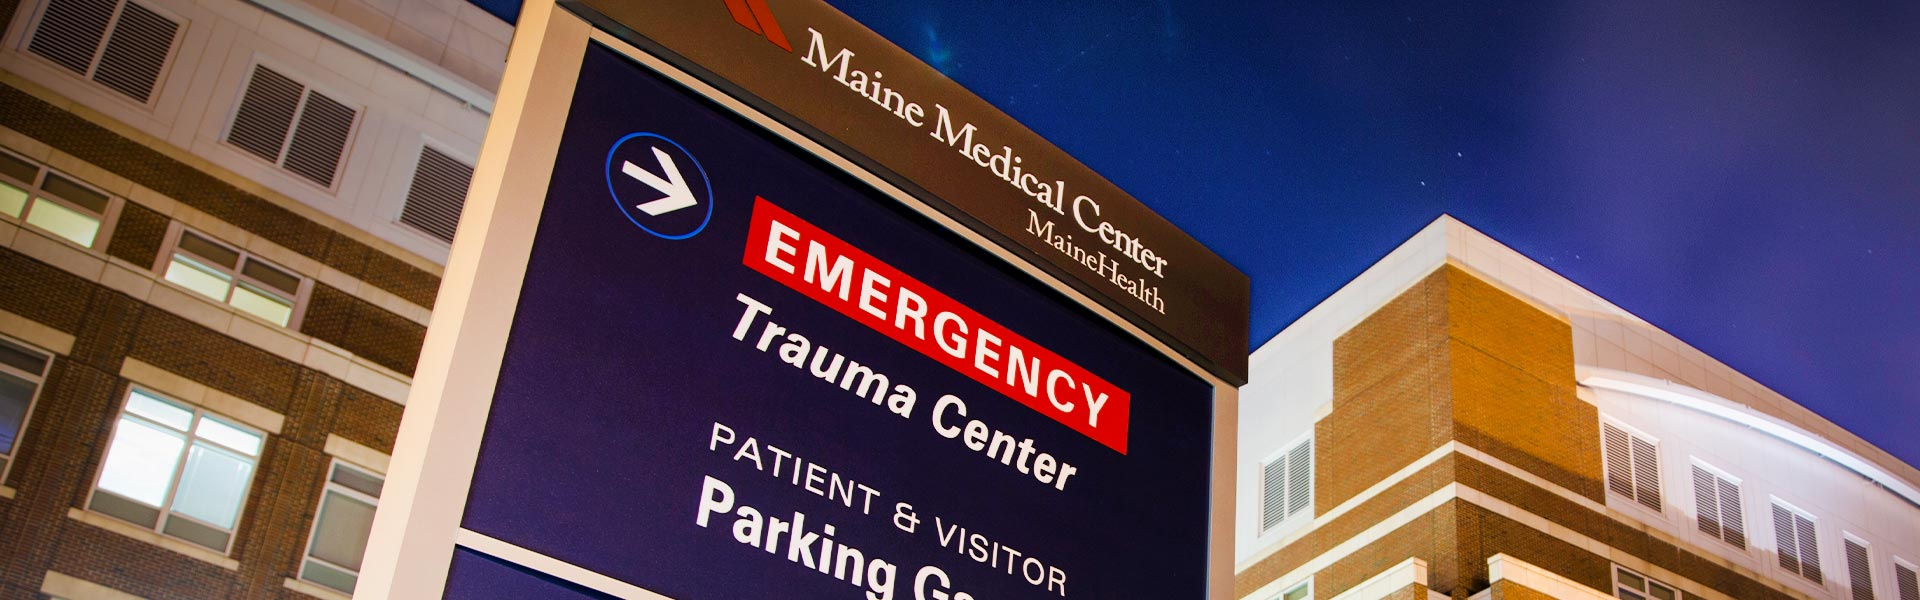 Emergency Department   Maine Medical Center   Portland, ME